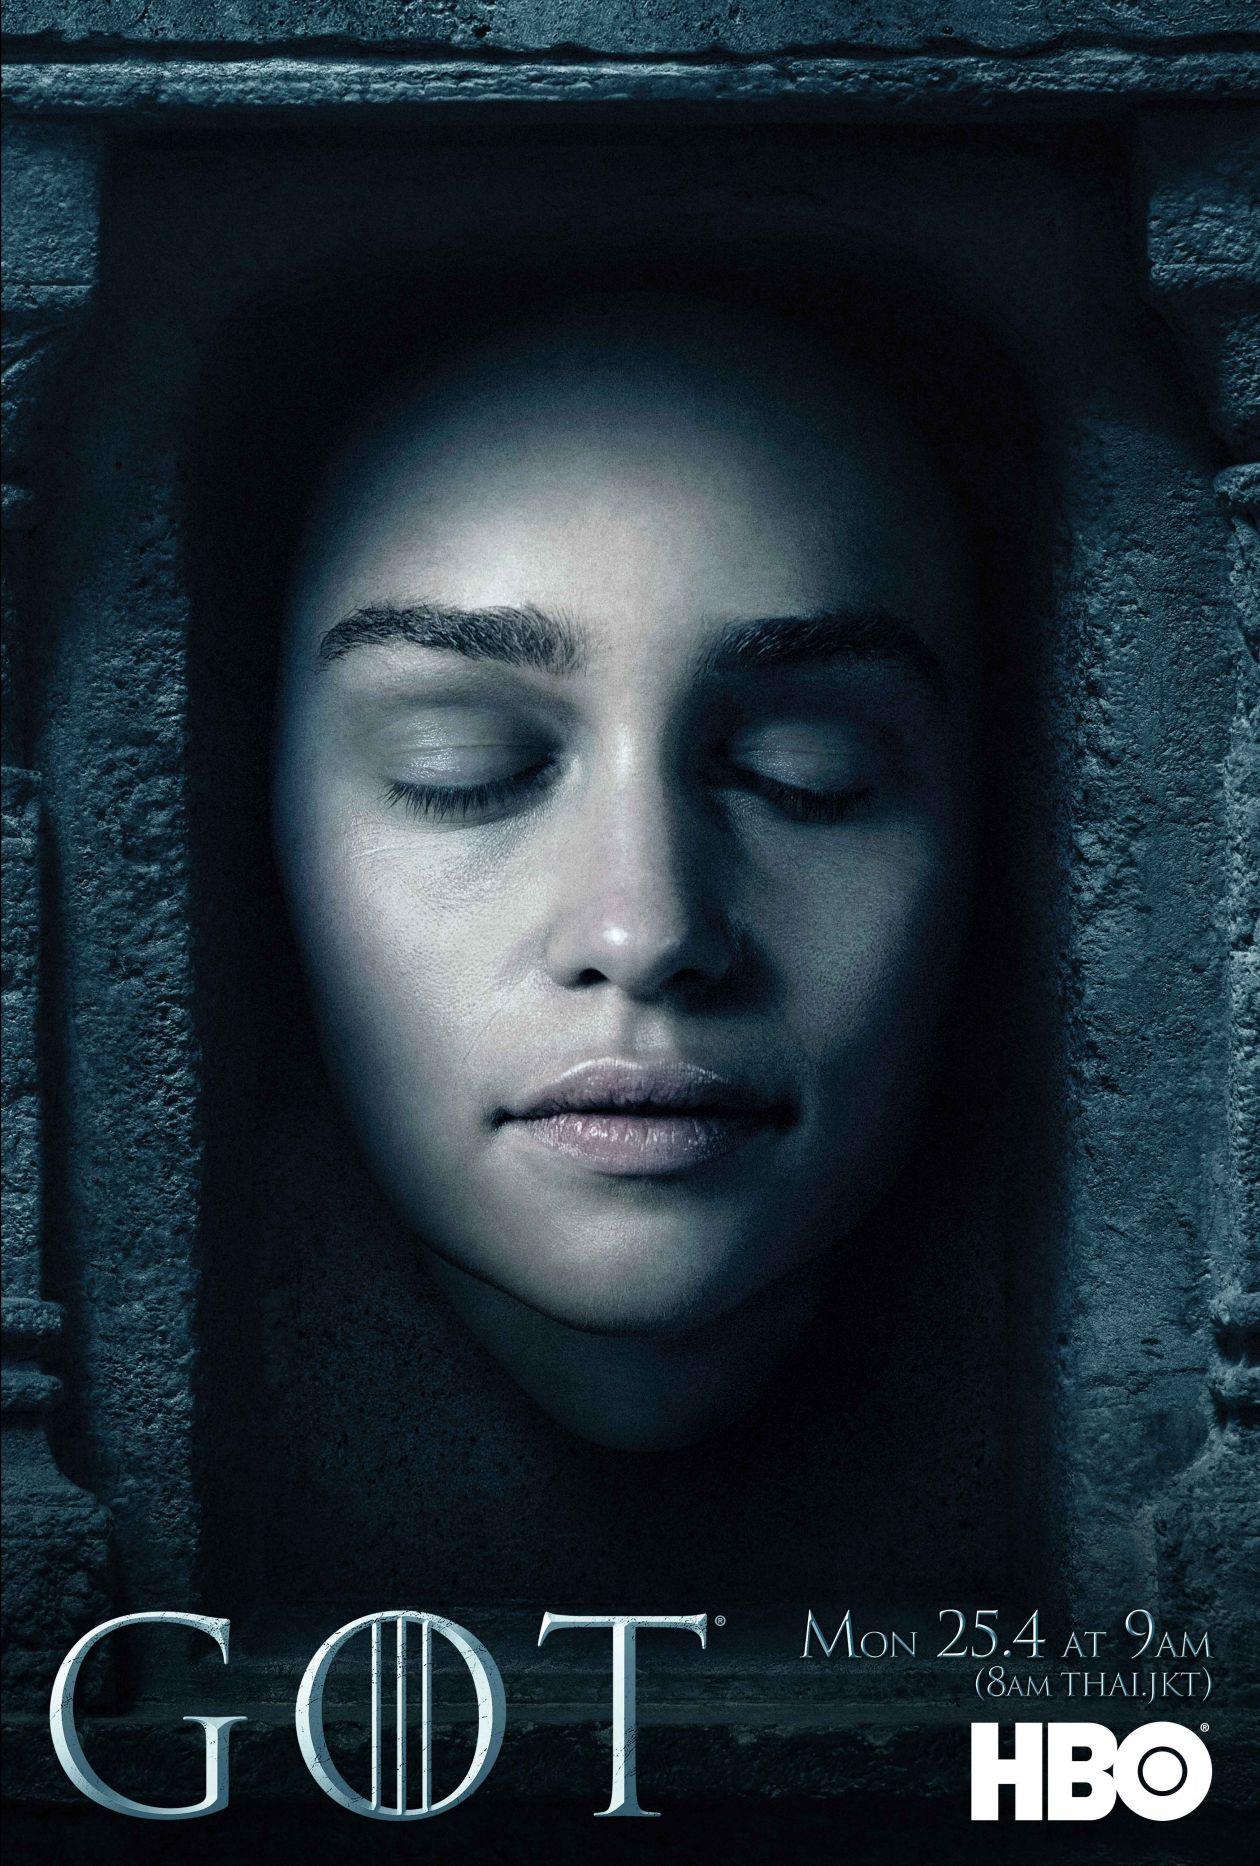 Emilia Clarke actress | Queen Daenerys Targaryen / Game of Thrones / Movie Series Season 6 Poster Affiche série Saison 6 2016